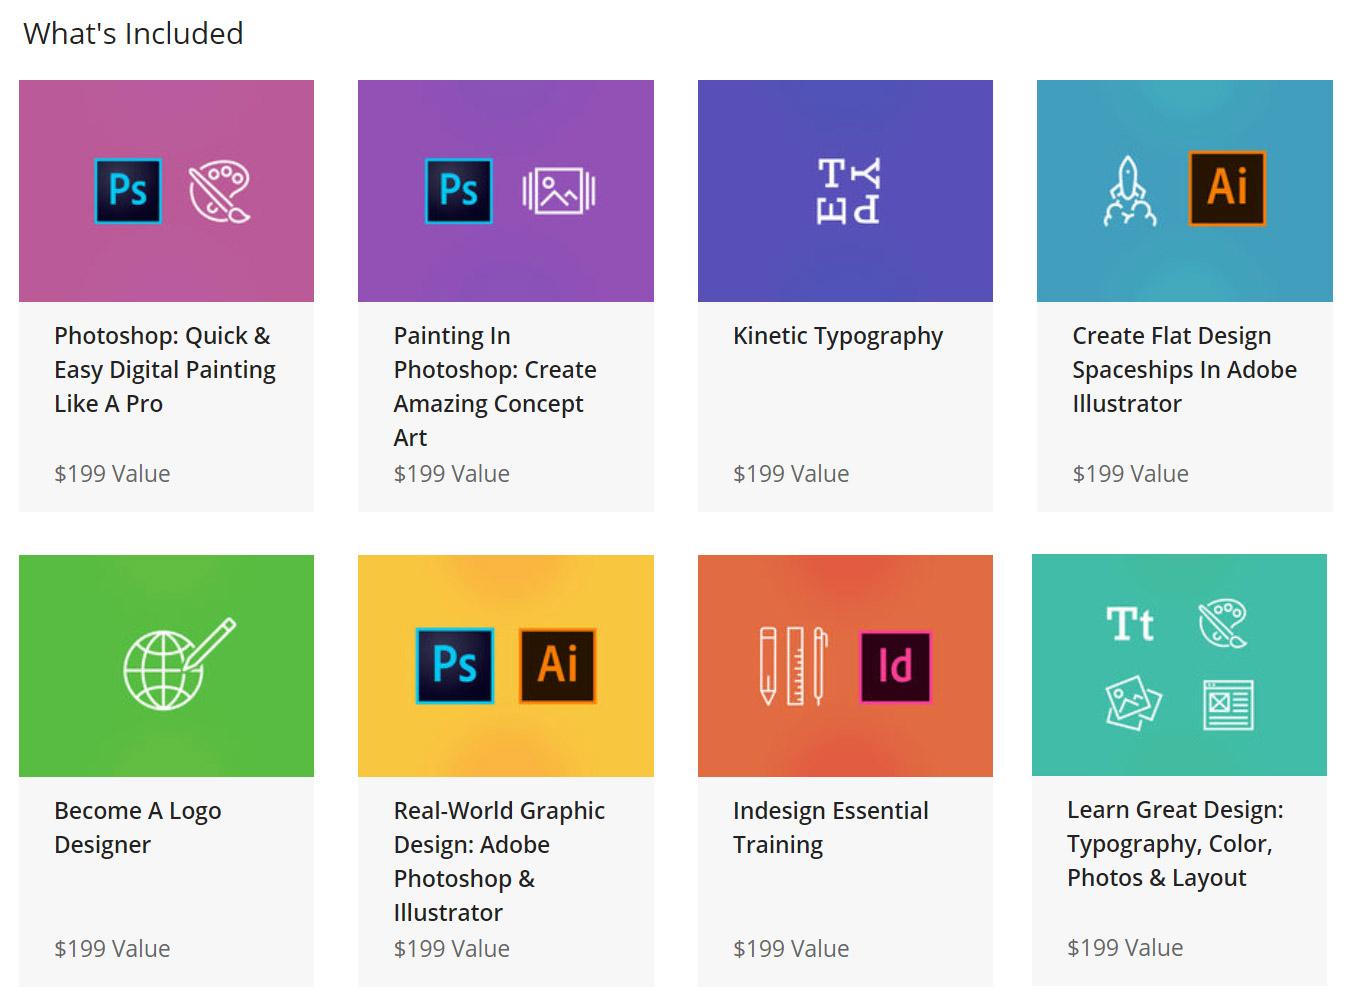 Ultimate Graphic Design Bundle 2018